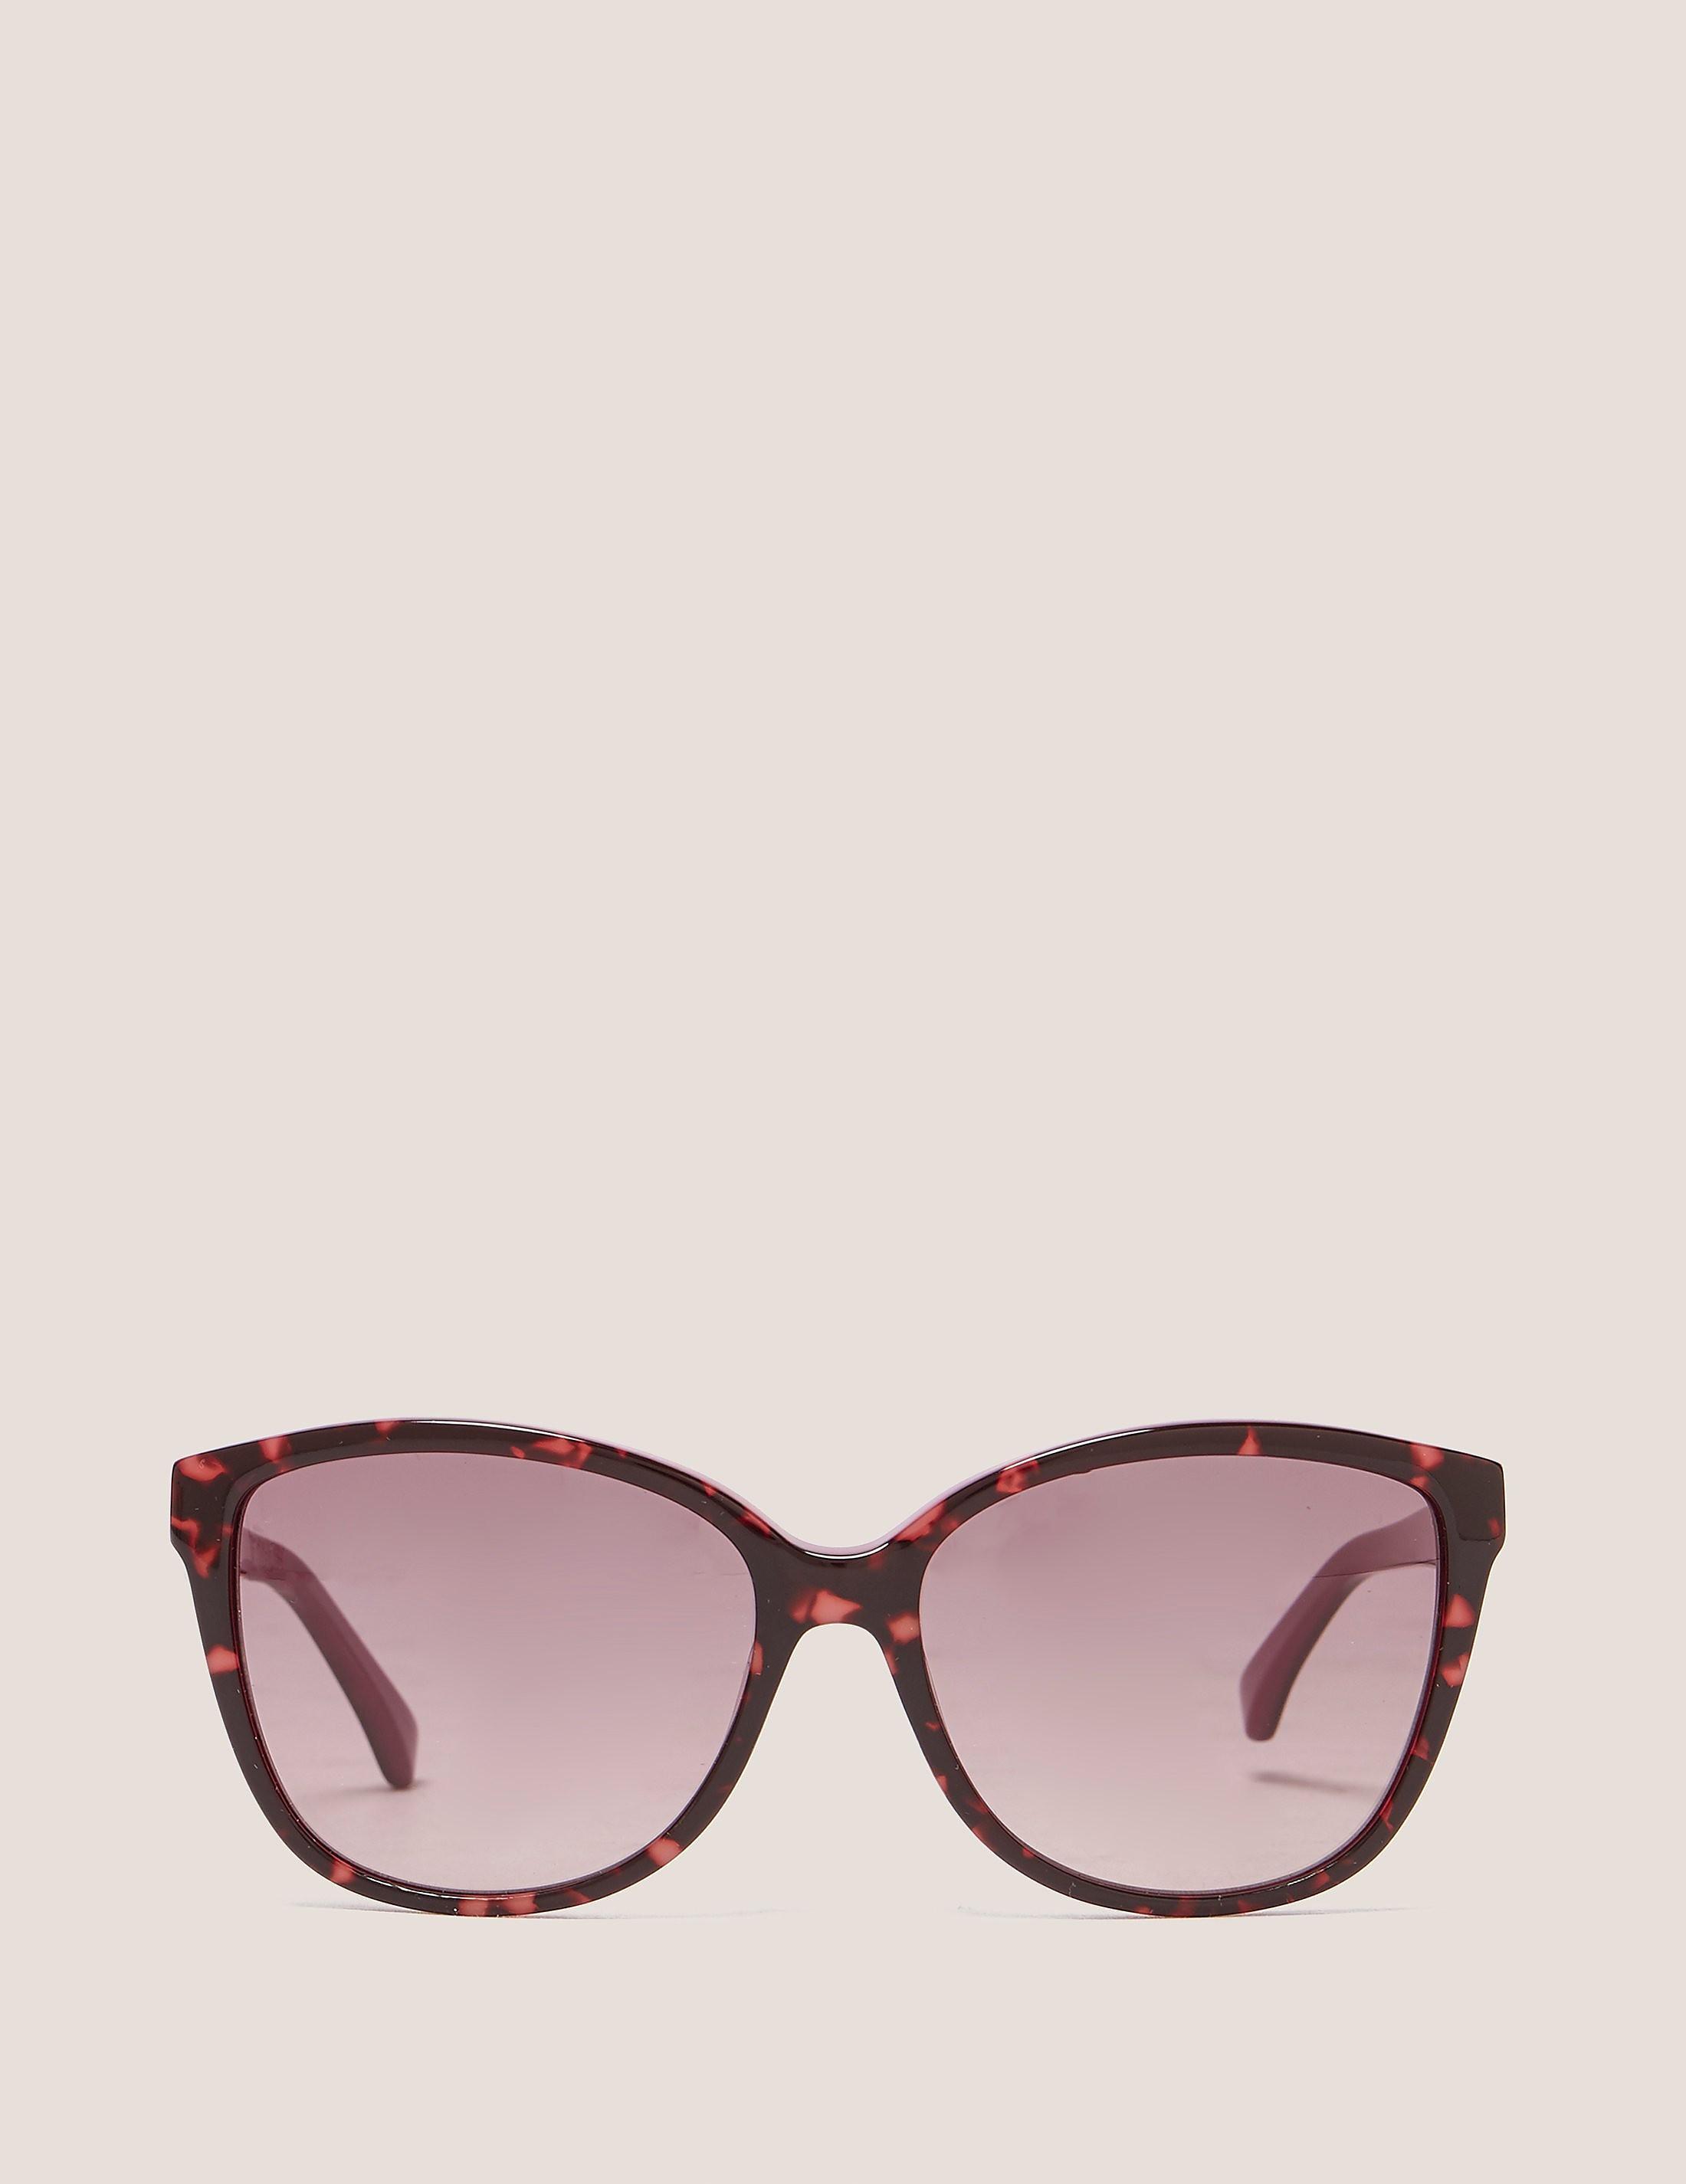 Calvin Klein Teacup Sunglasses